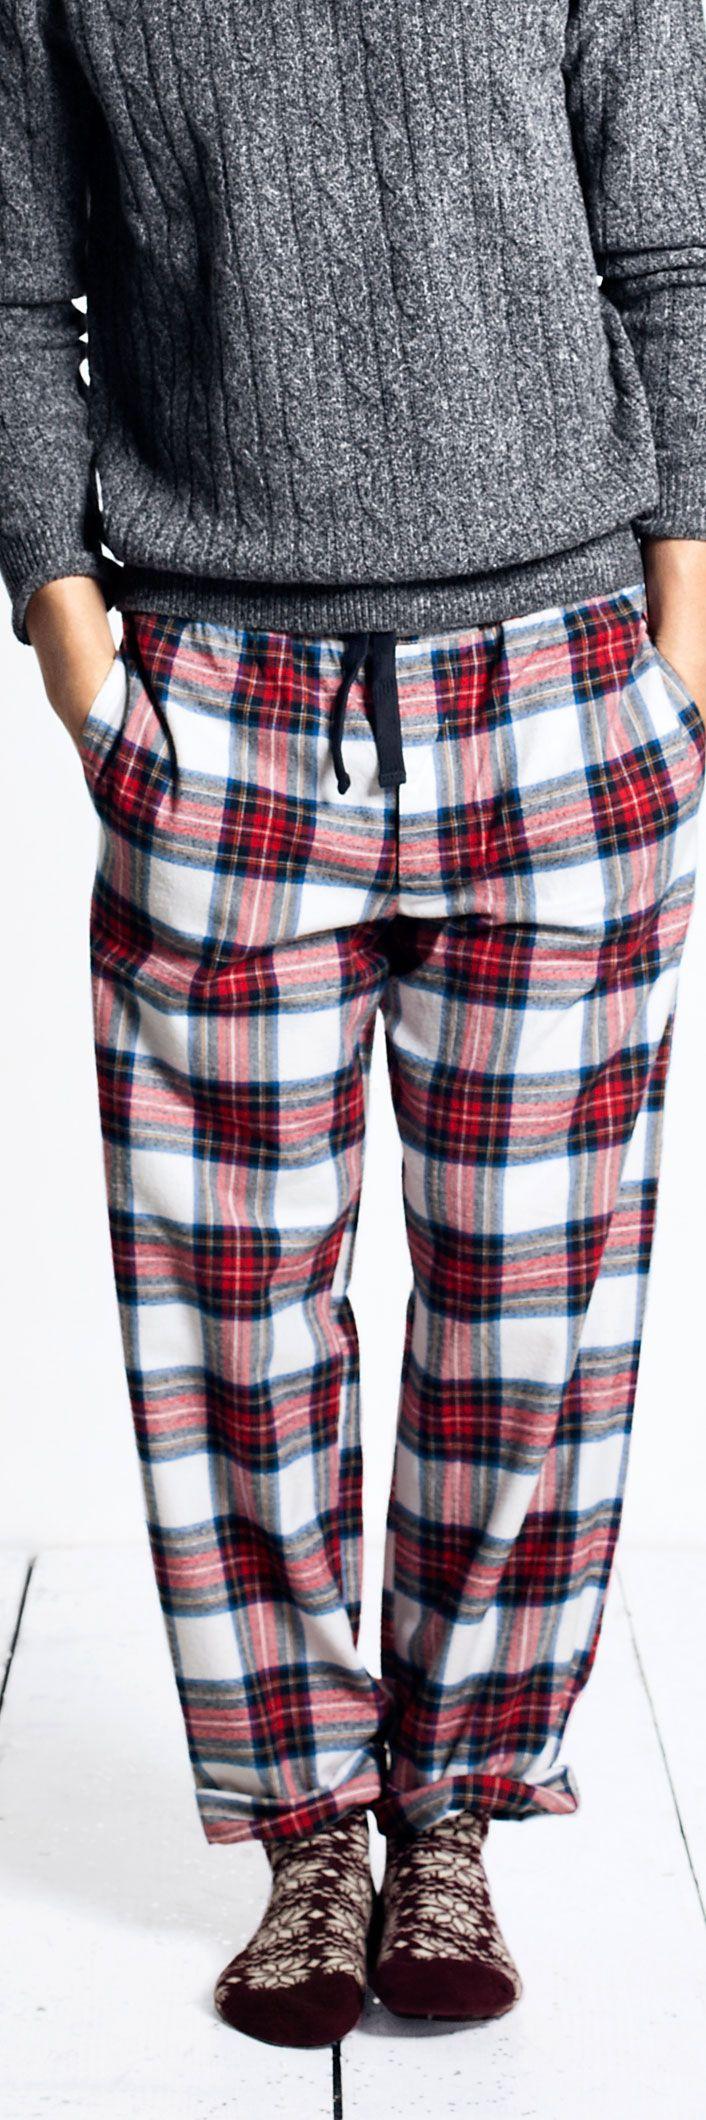 Mens Loungewear   Tees, Shorts & Pants   Jack Wills